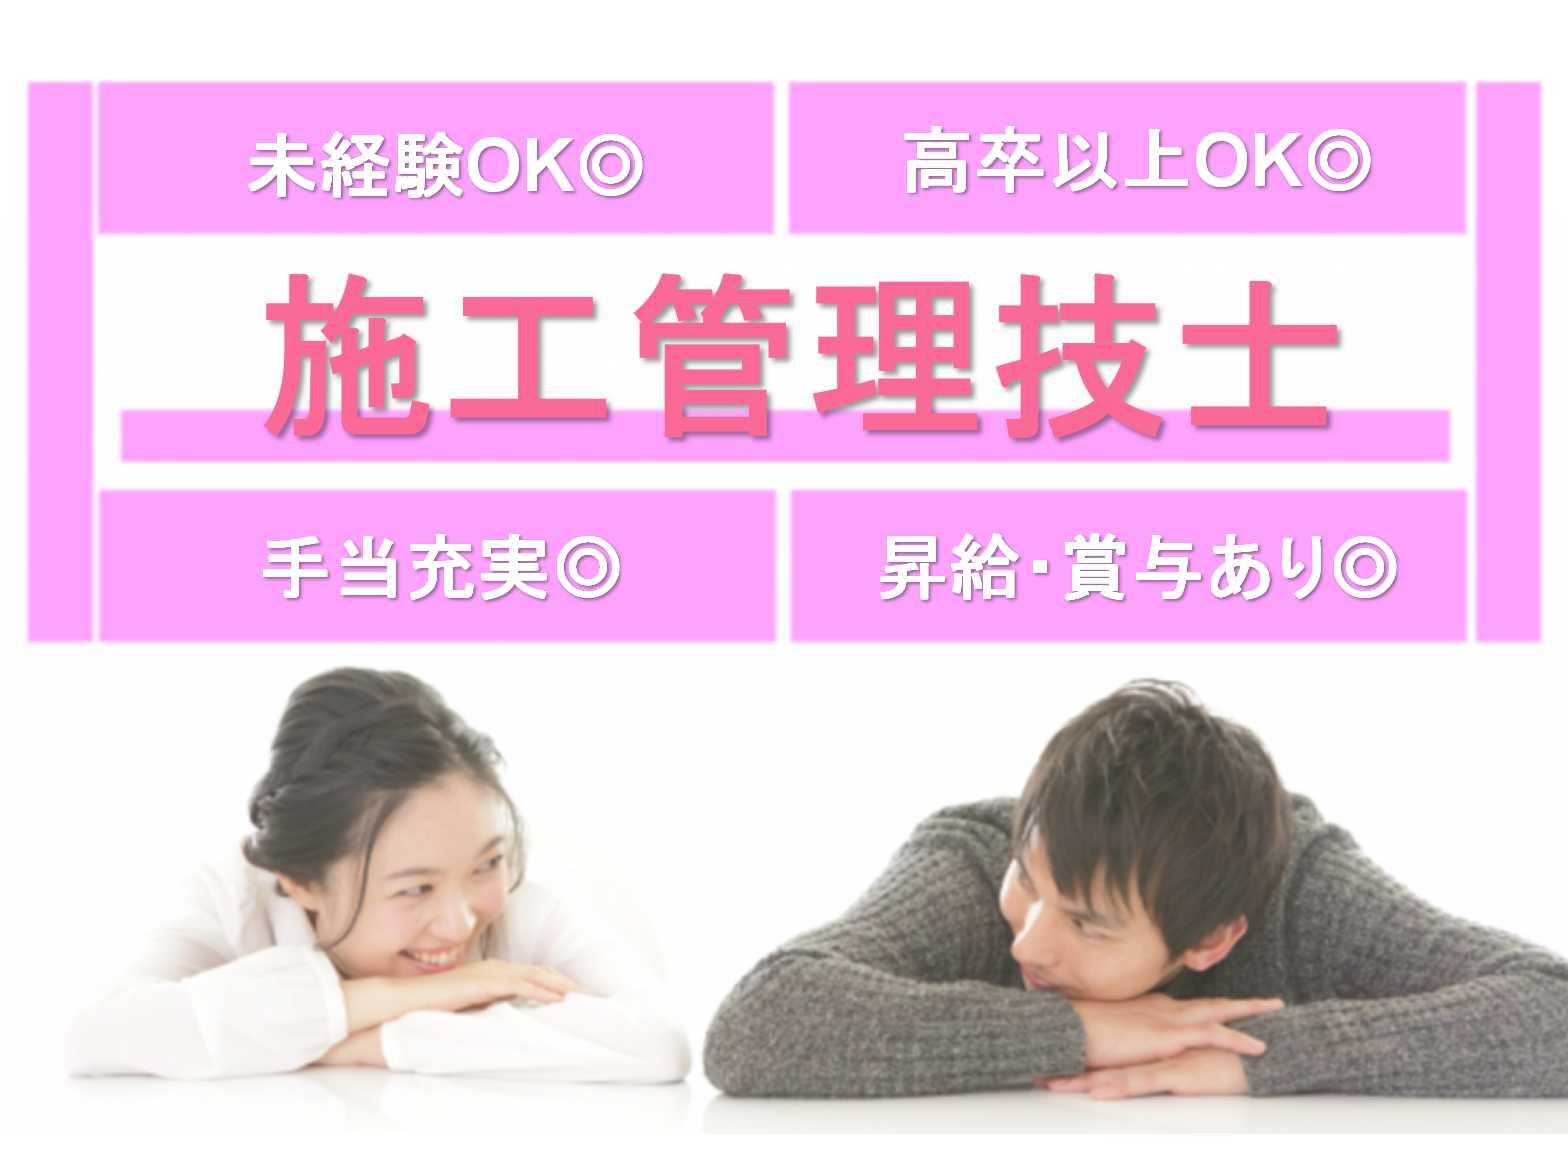 【名古屋市内全域】◆手当充実◆昇給・賞与あり◆施工管理技士◆募集中◆ イメージ